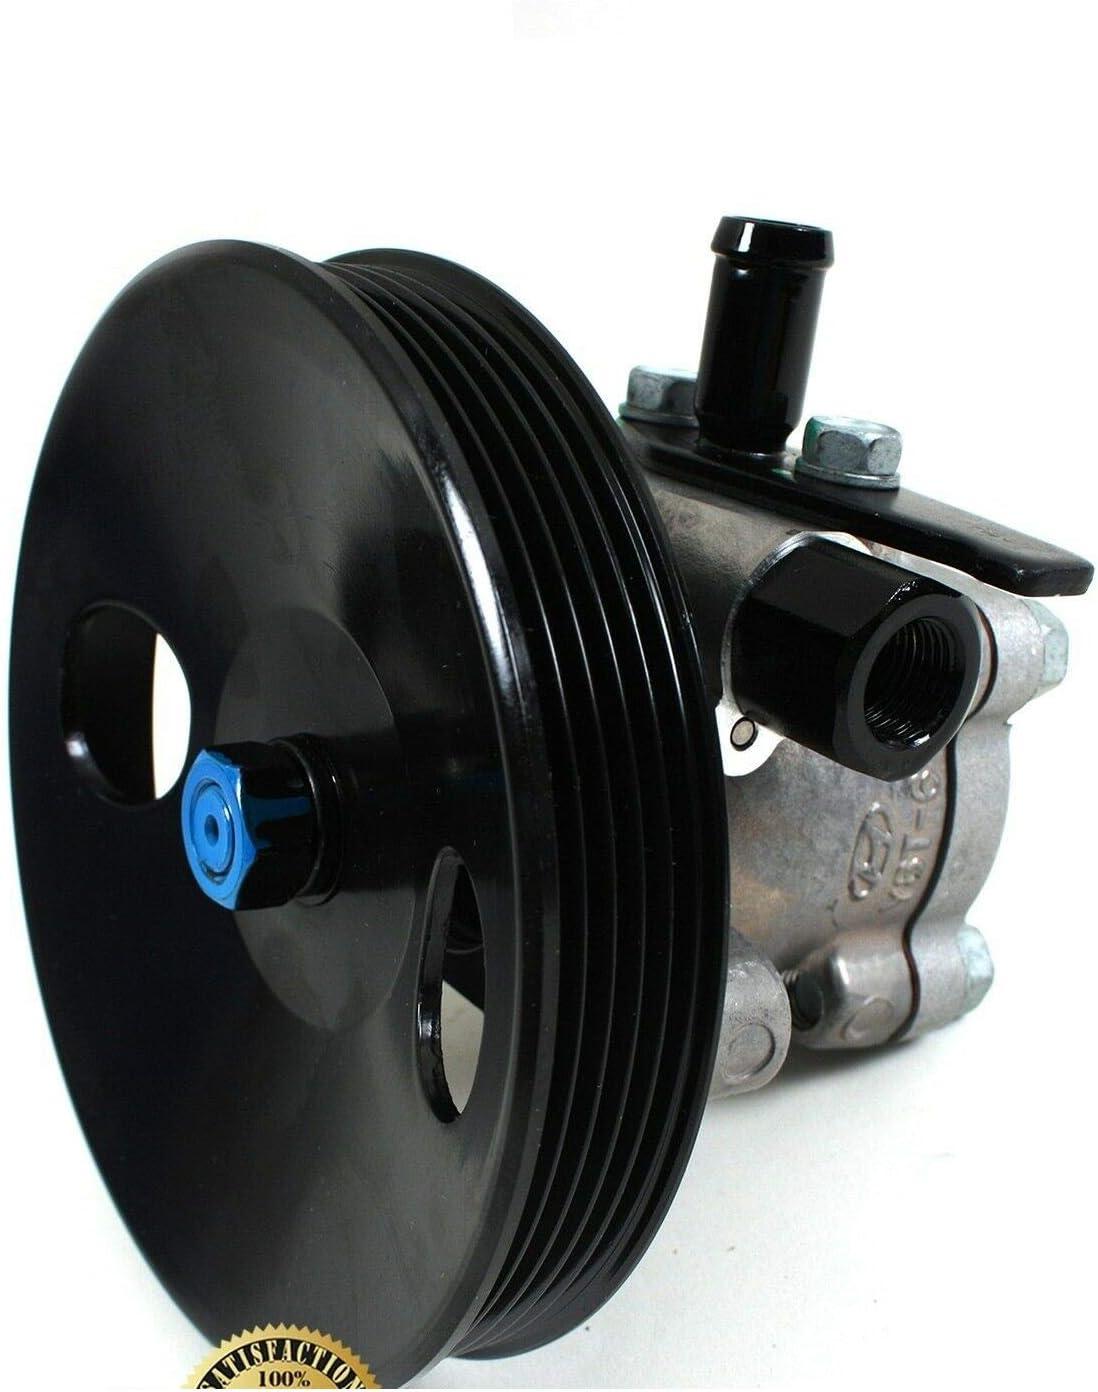 2.7L Power Steering Reservoir for 2001-2006 Hyundai Santa Fe 2.0L 2.4L